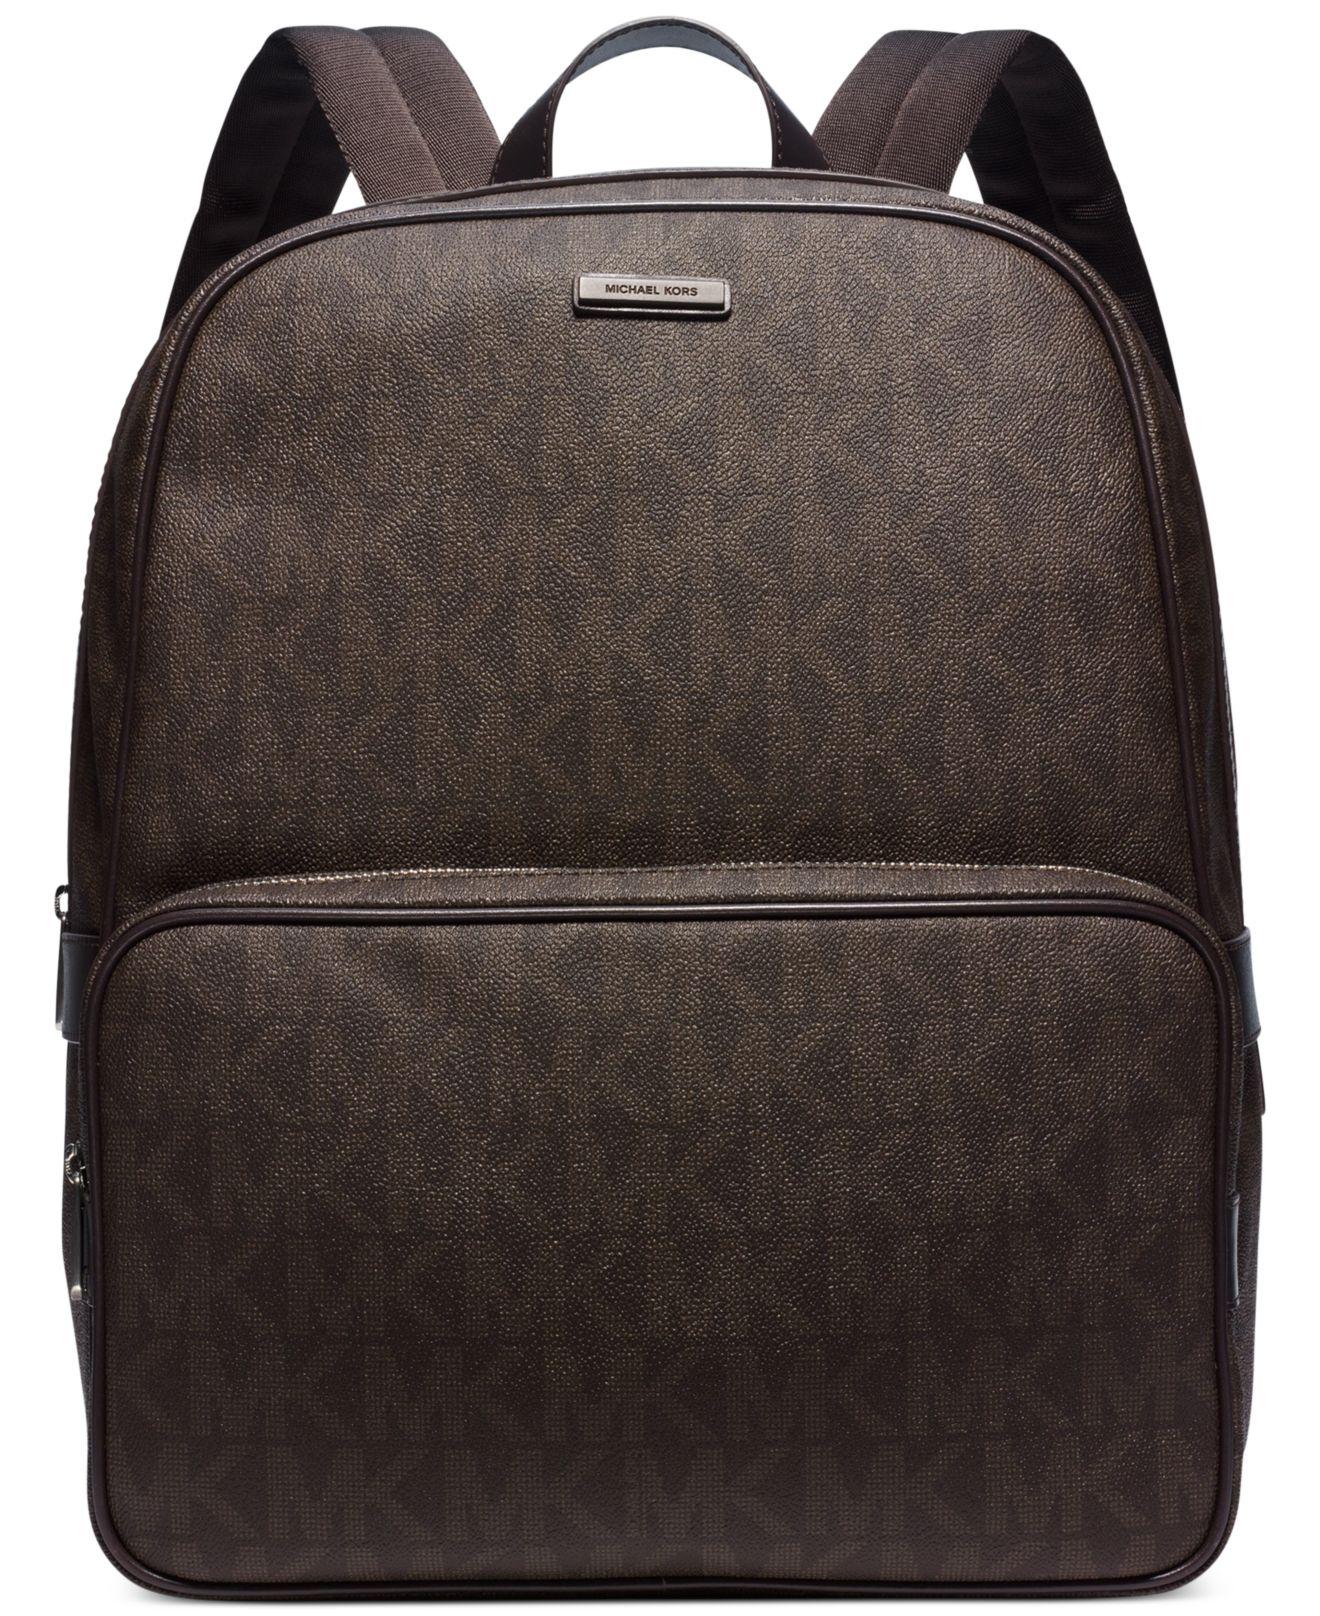 fafe7bfa6b42 Lyst - Michael Kors Jet Set Shadow Backpack in Brown for Men